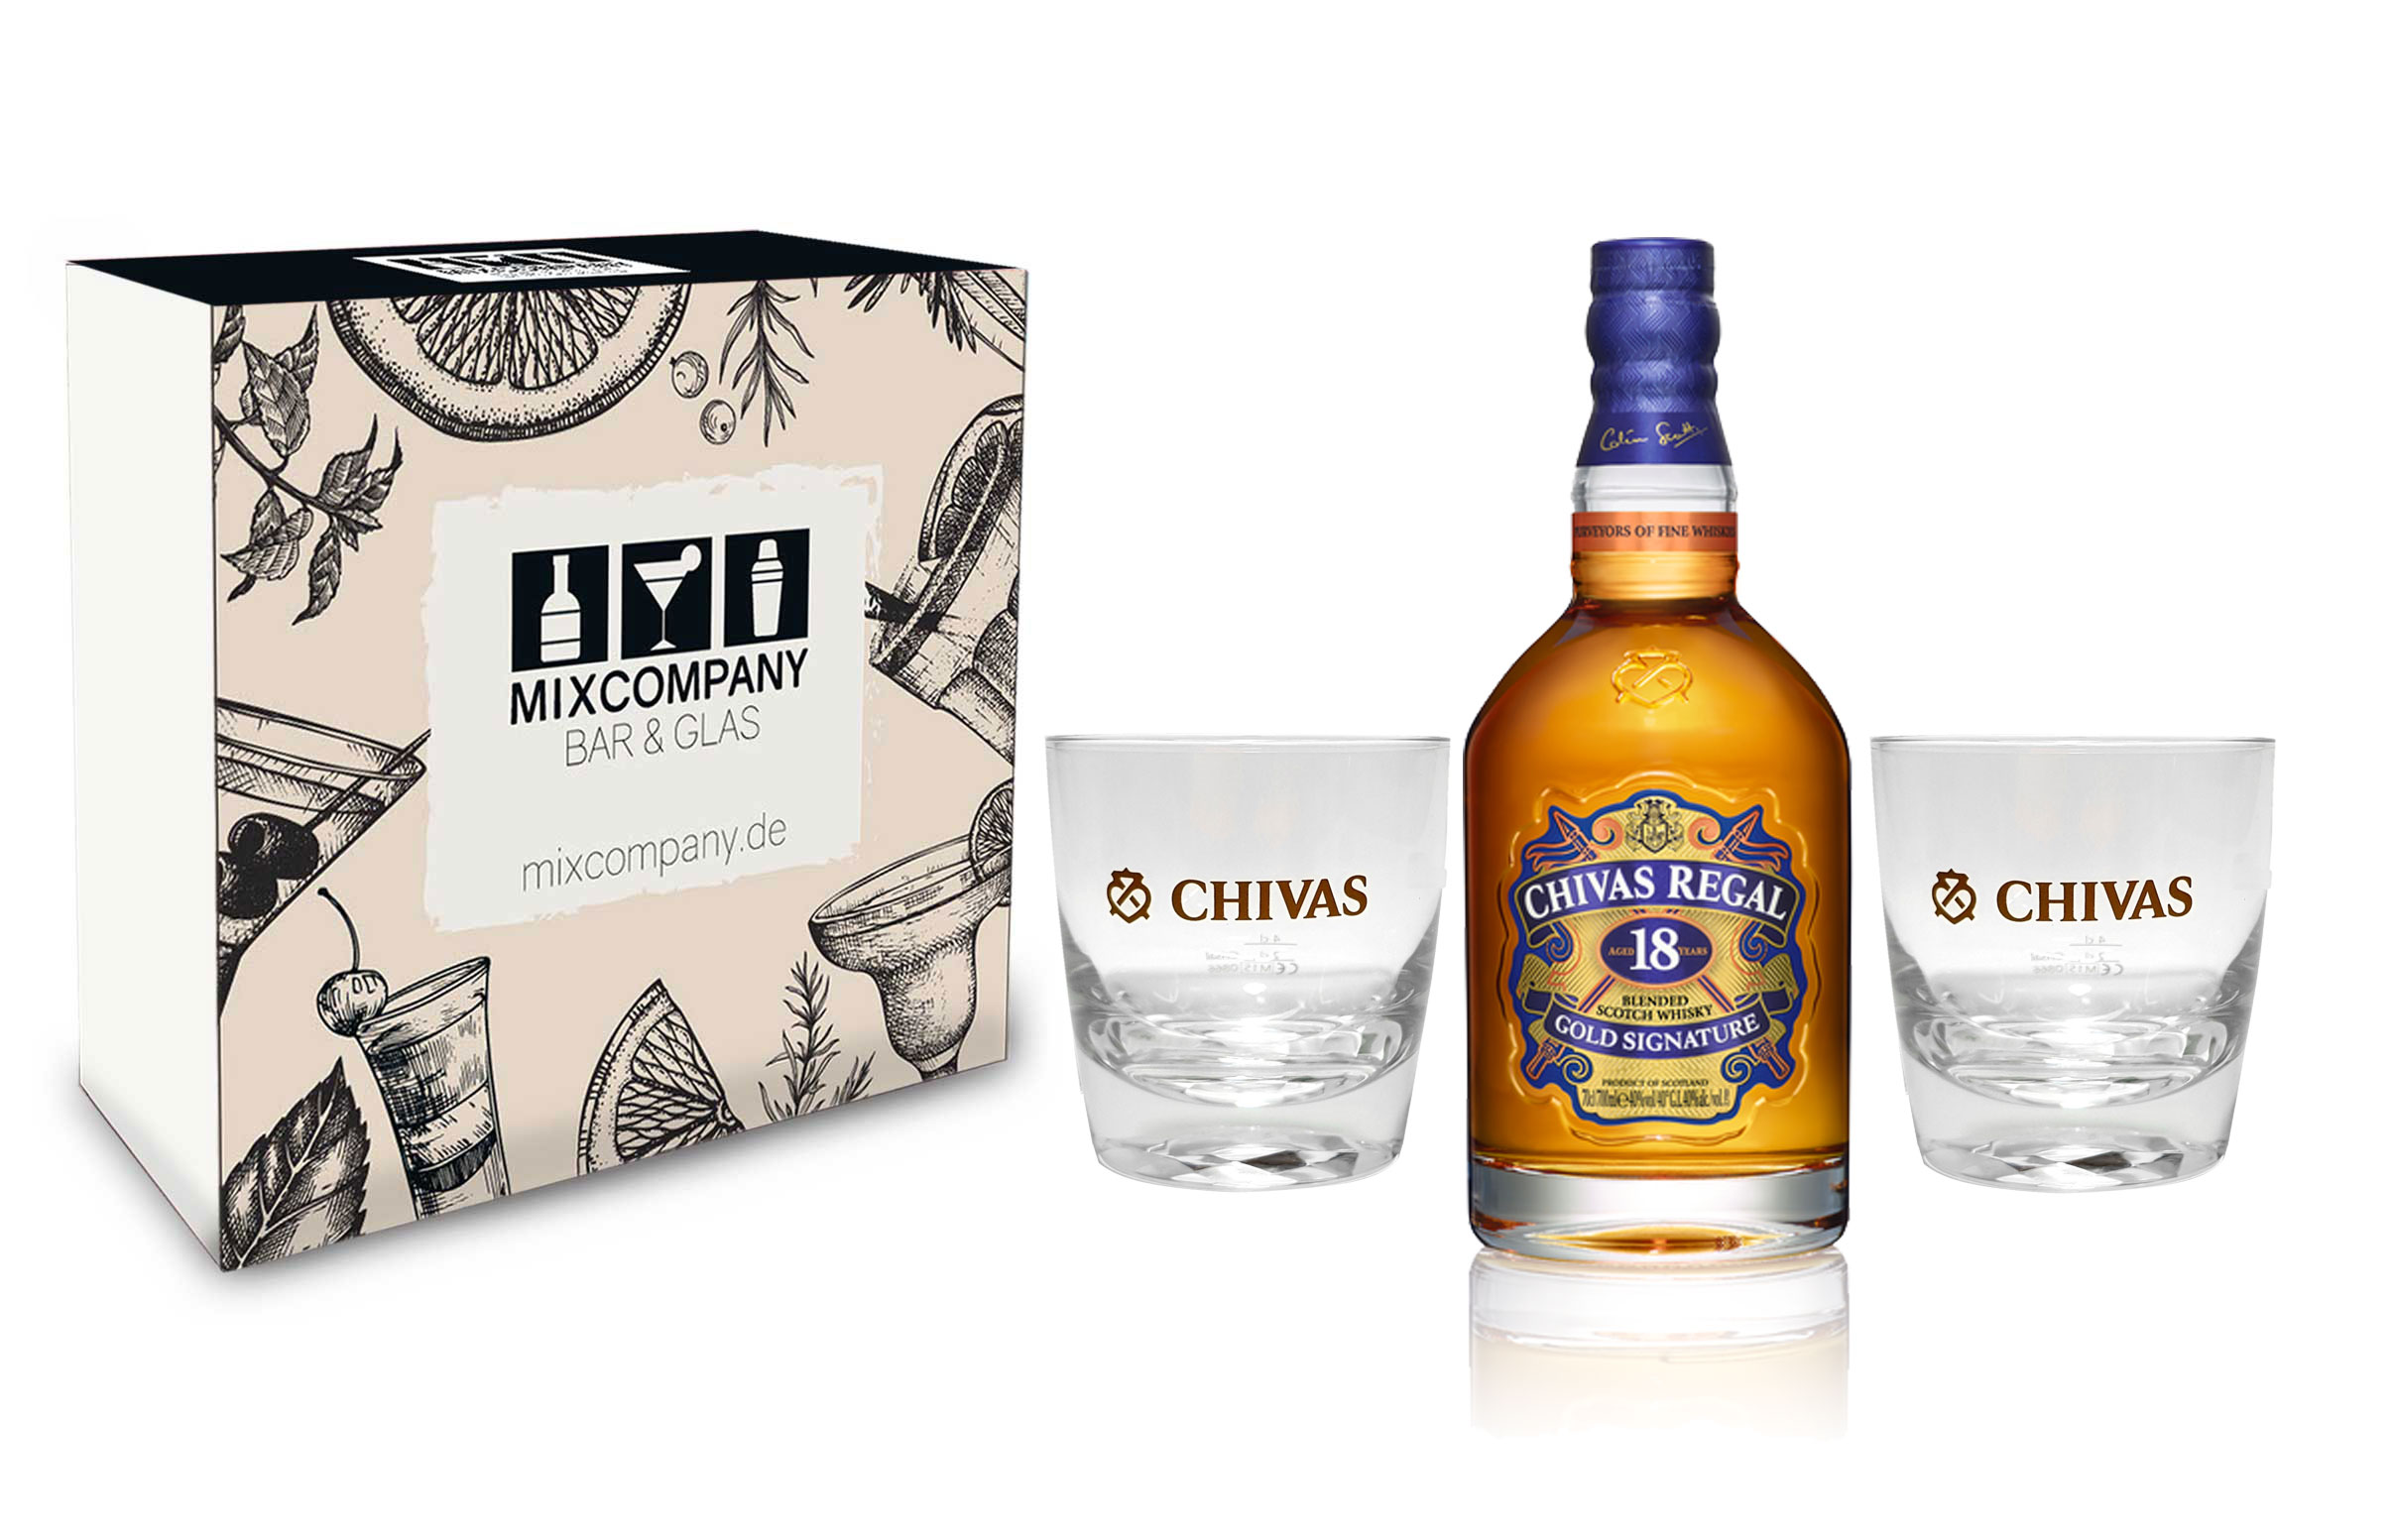 Chivas Regal Set / Geschenkset - Chivas Regal Gold Signature 18 Jahre Whisky ,Whiskey,Scotch 0,7l (40% Vol) + 2 Tumbler